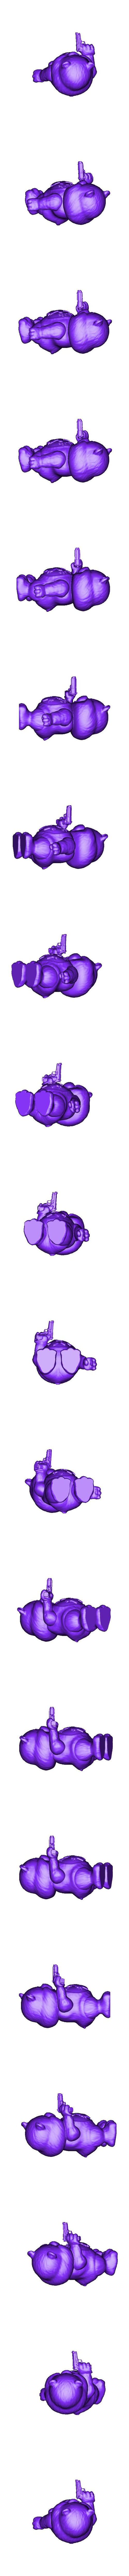 Hug life bear.stl Télécharger fichier STL Collection No Care Bear • Objet imprimable en 3D, LittleTup